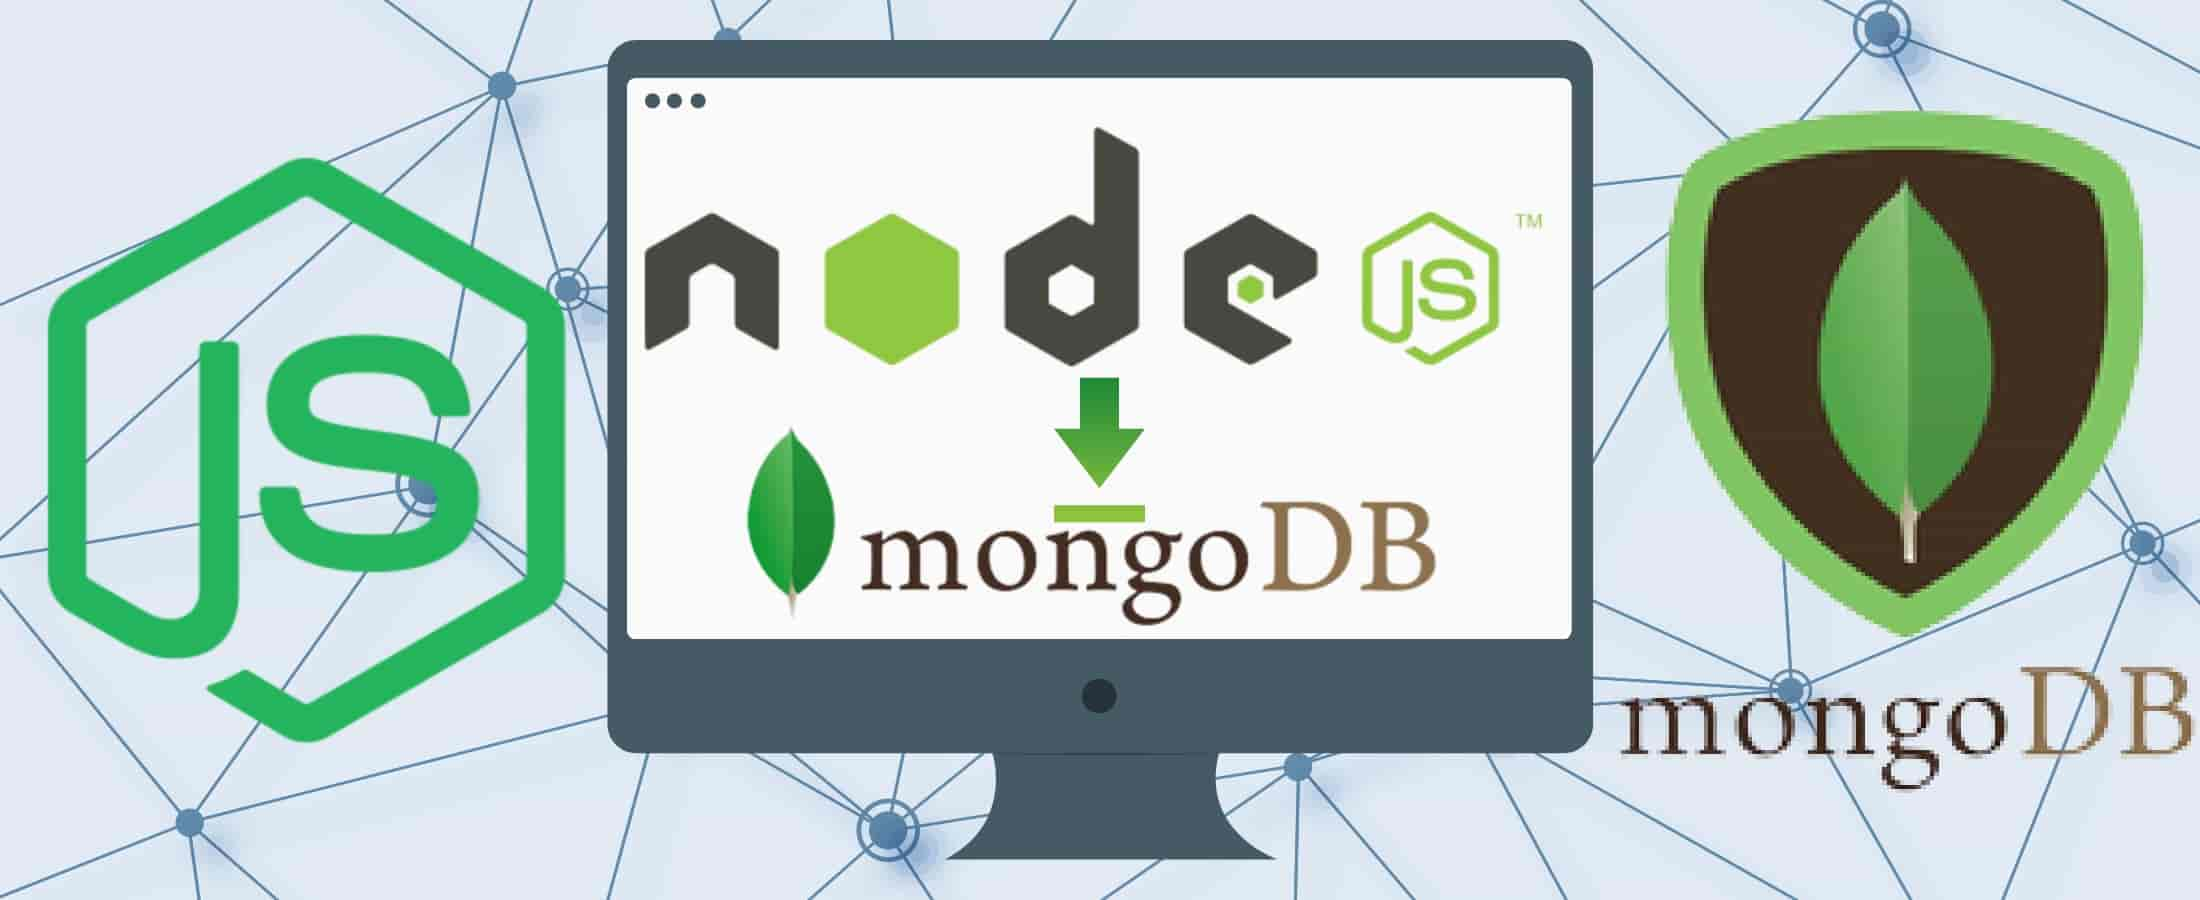 Installing the MongoDB Node.js app development company driver